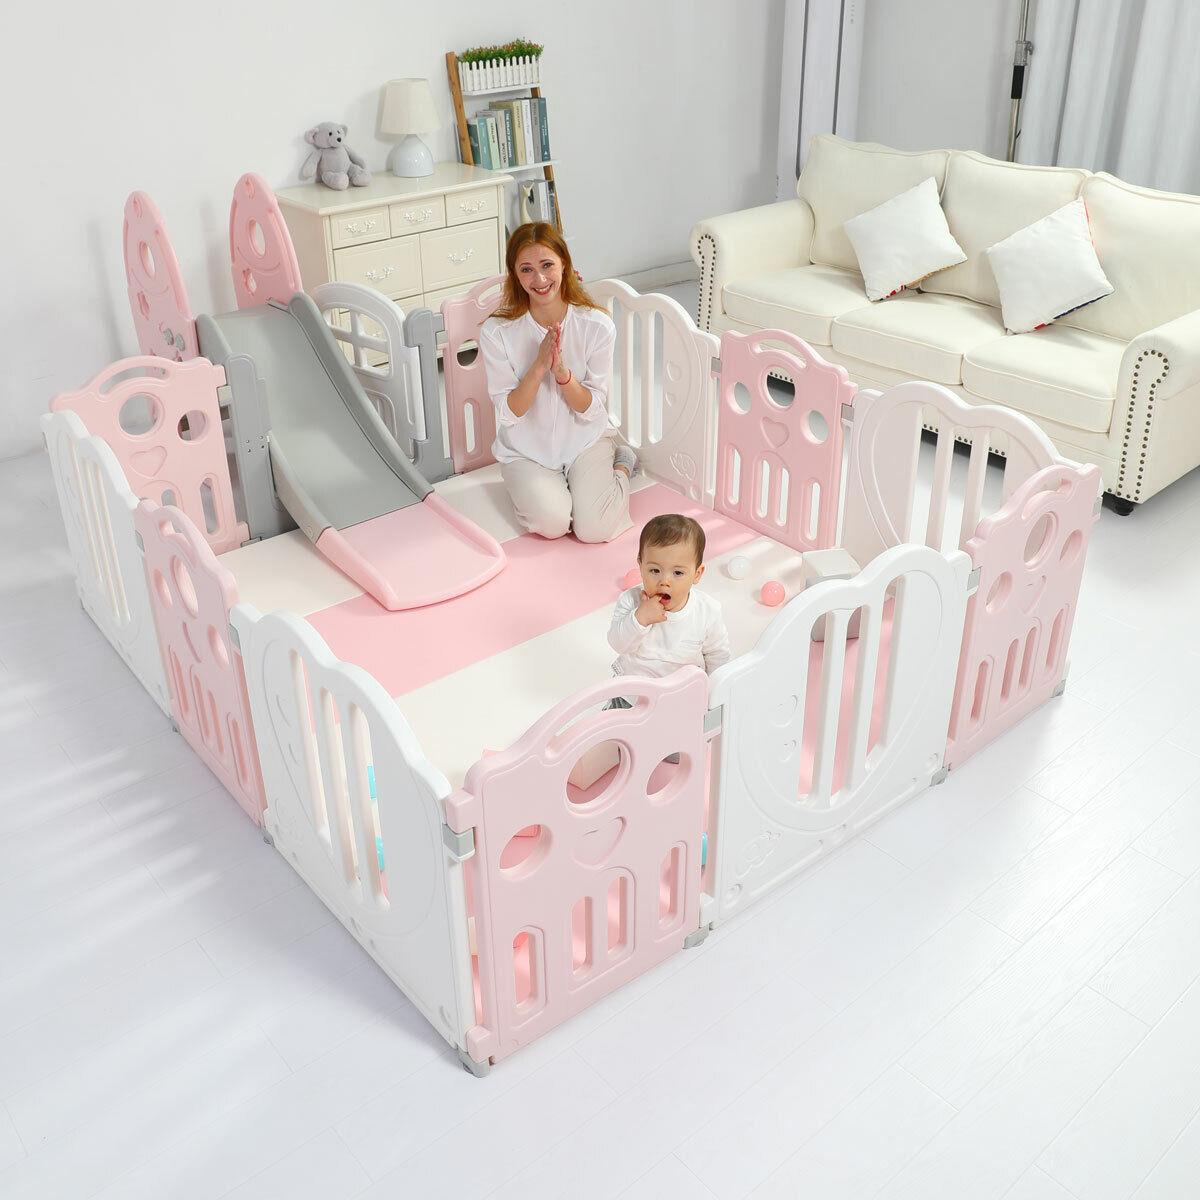 Baby Playpen Kids Activity Centre